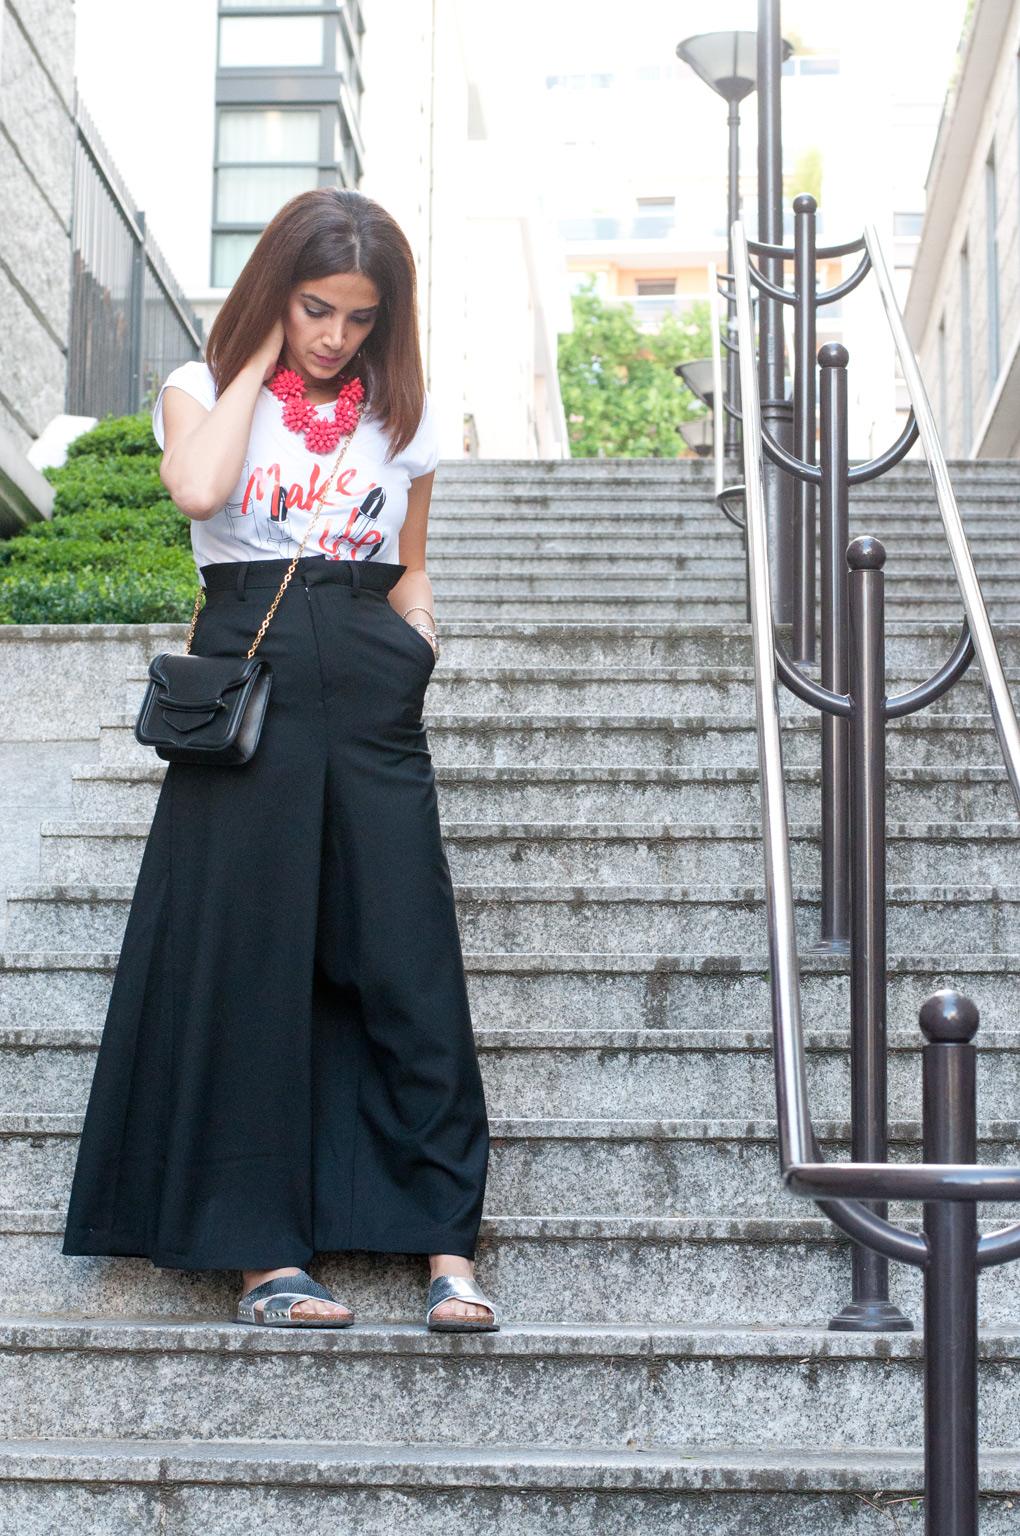 Lyla_Loves_Fashion_Junya_Watanabe_Trousers_Stella_McCartney_Tshirt_5927